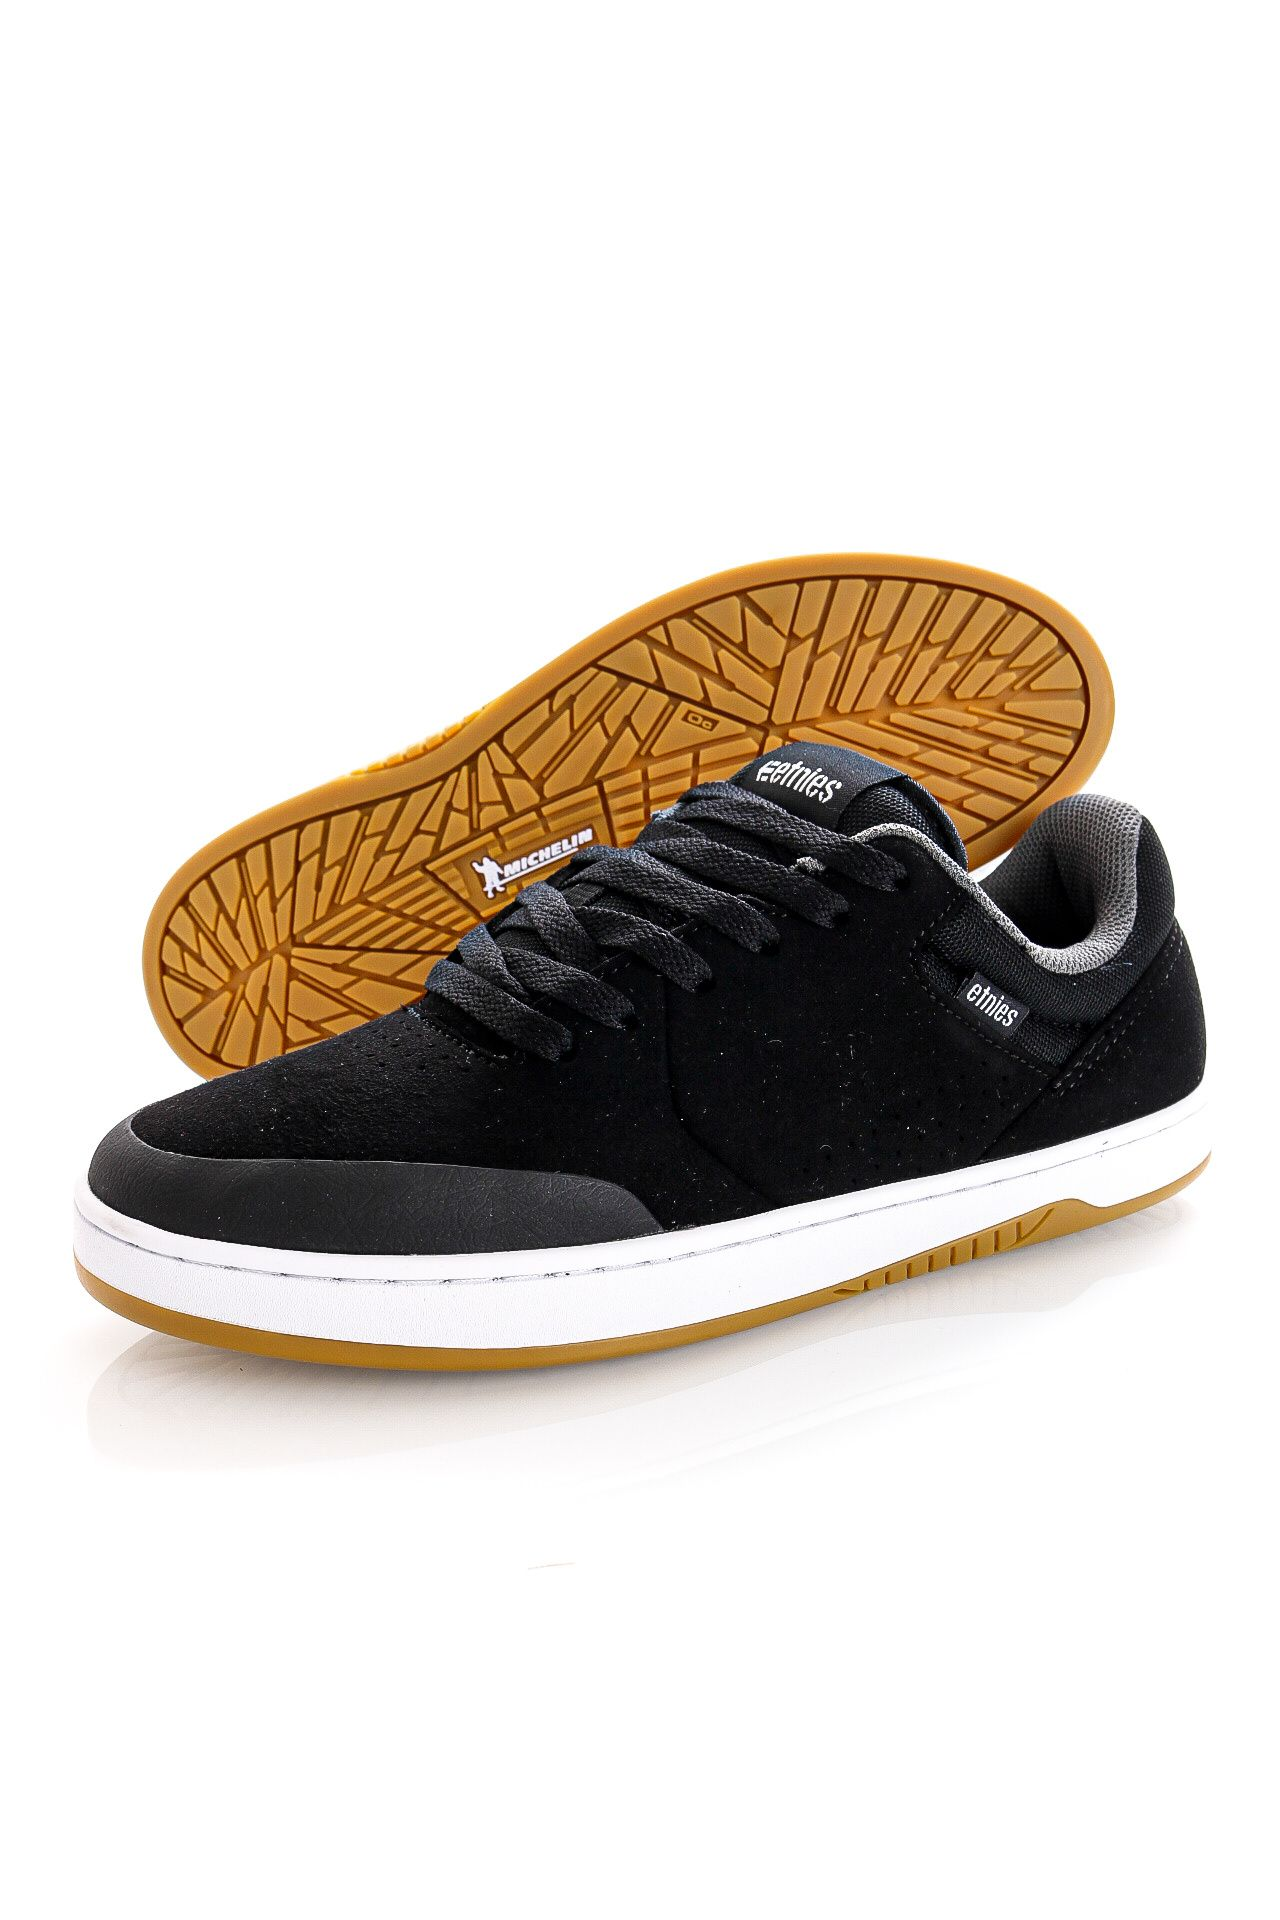 Afbeelding van Etnies Sneakers Marana Black/Charcoal 4101000403553